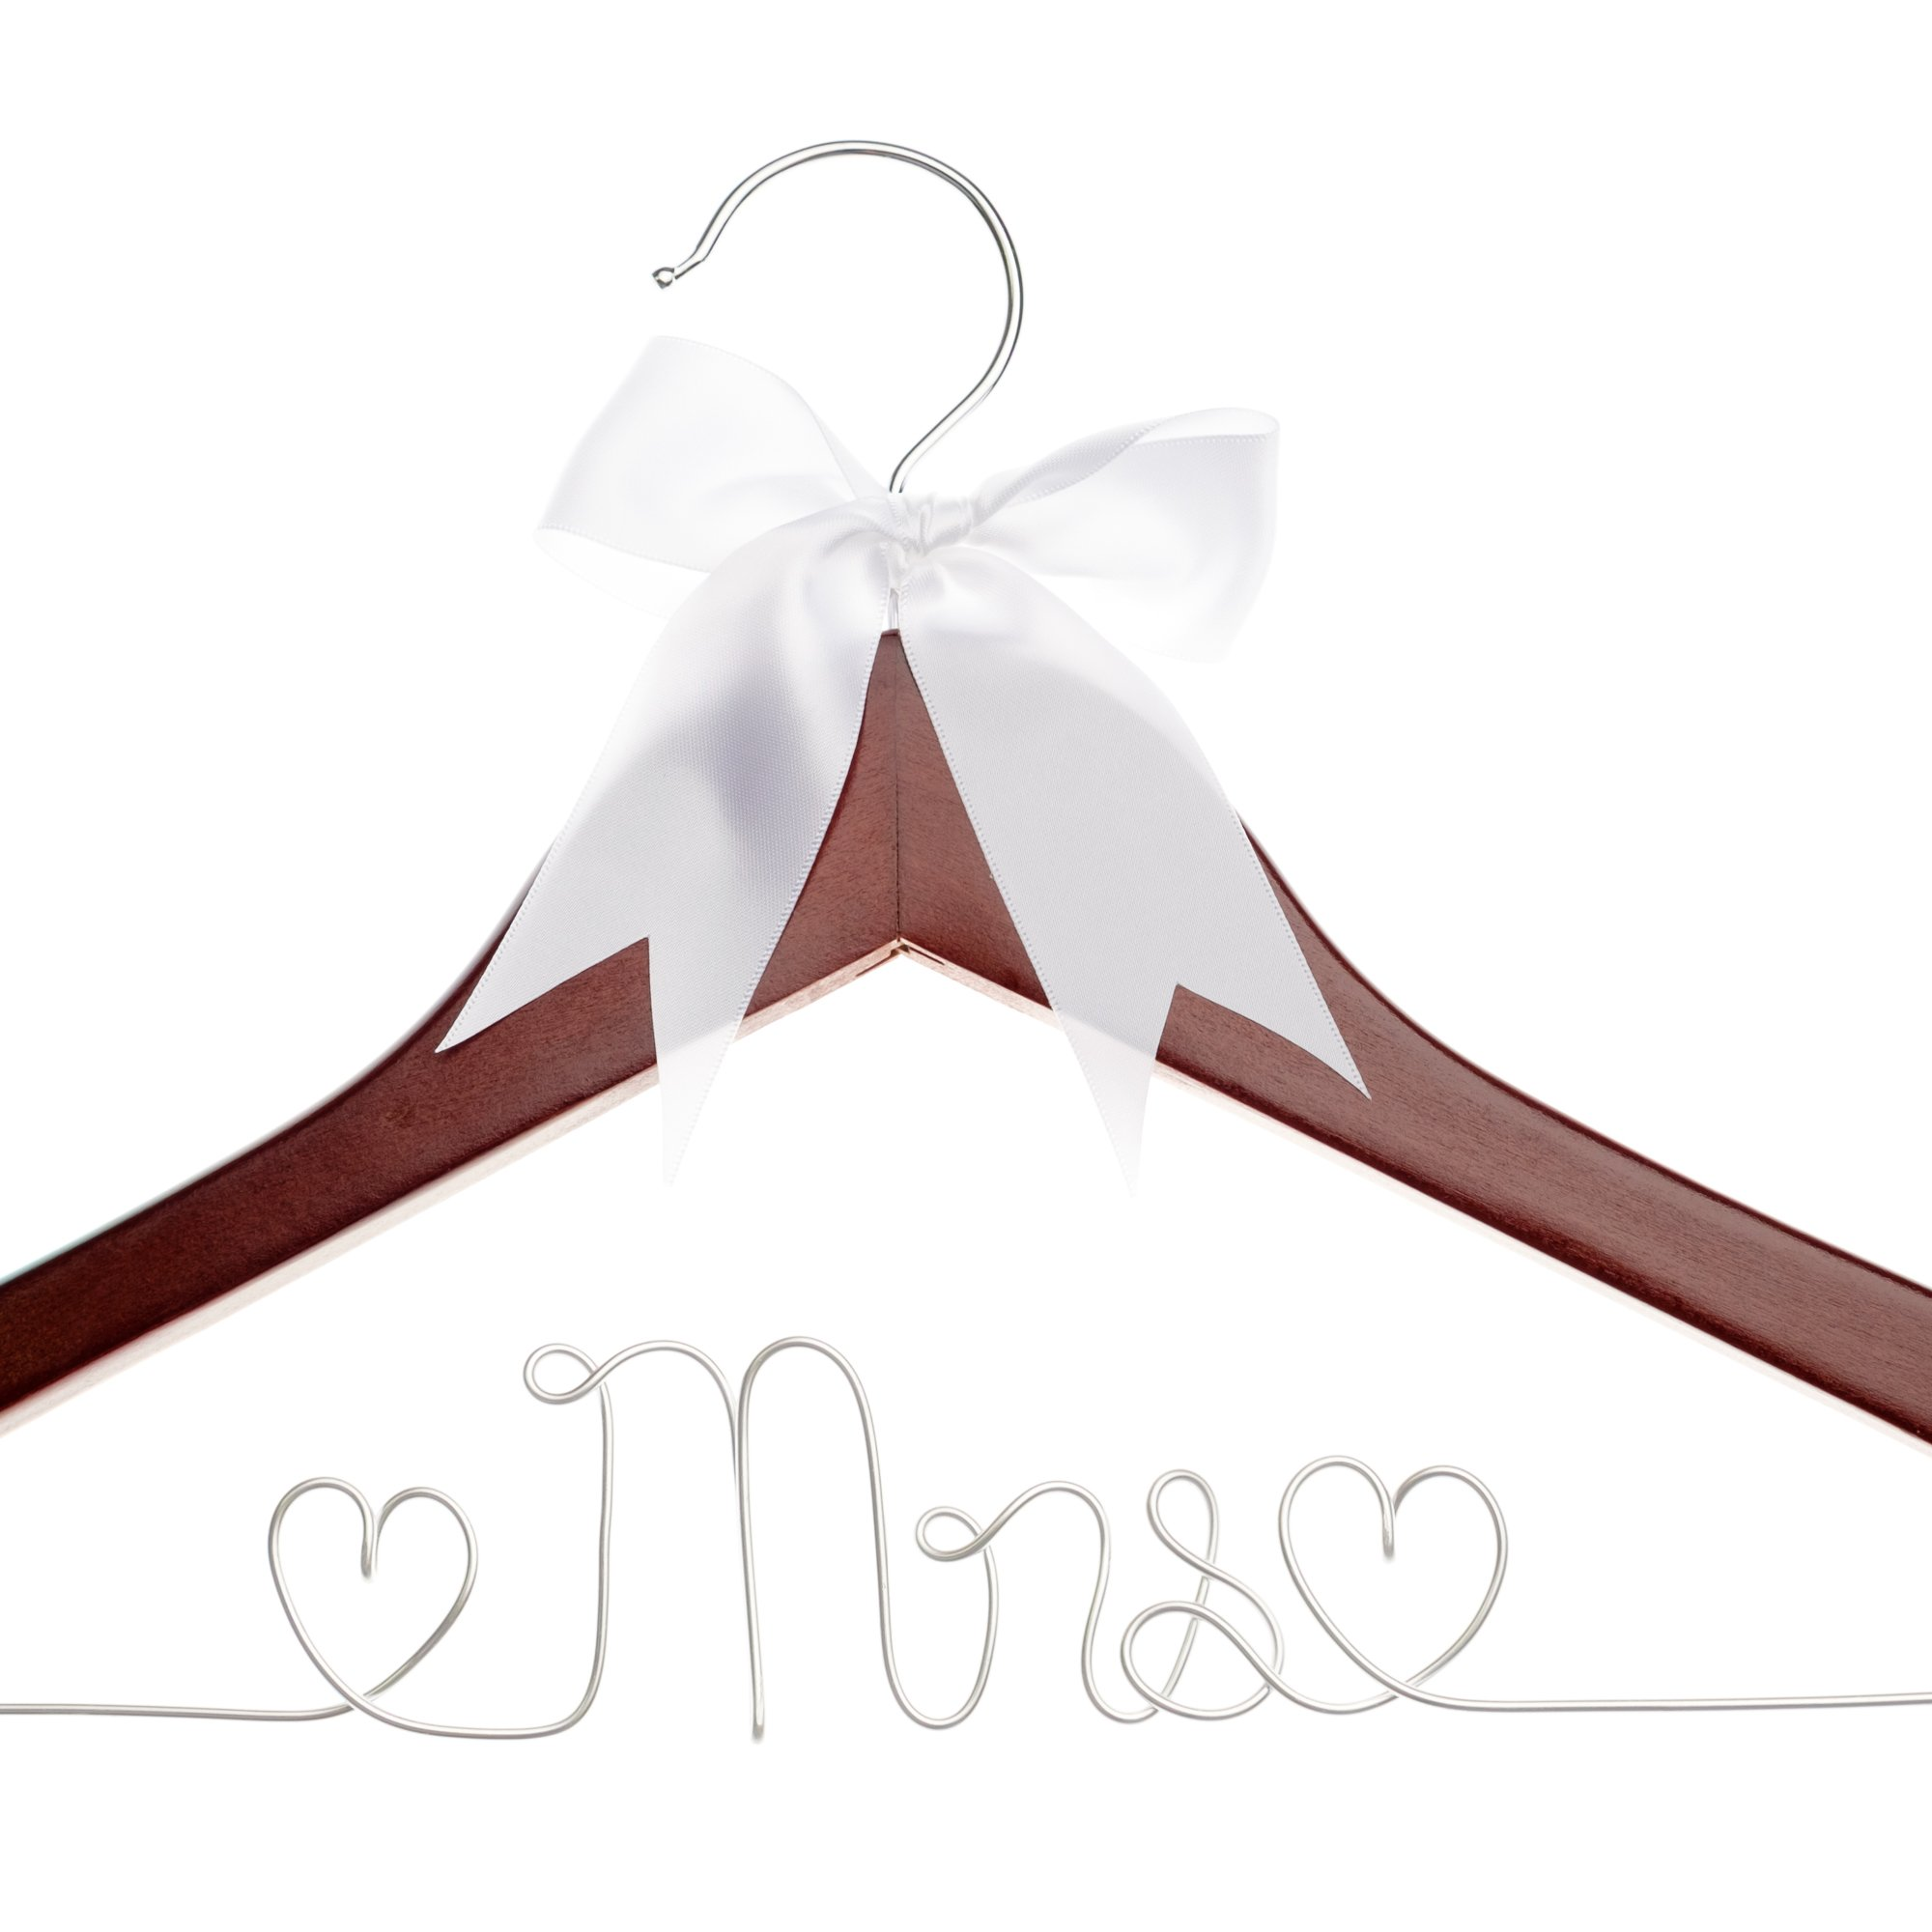 Ella Celebration Mrs Wedding Dress Hanger, Wood and Wire Hangers for Brides (Mahogany) by Ella Celebration